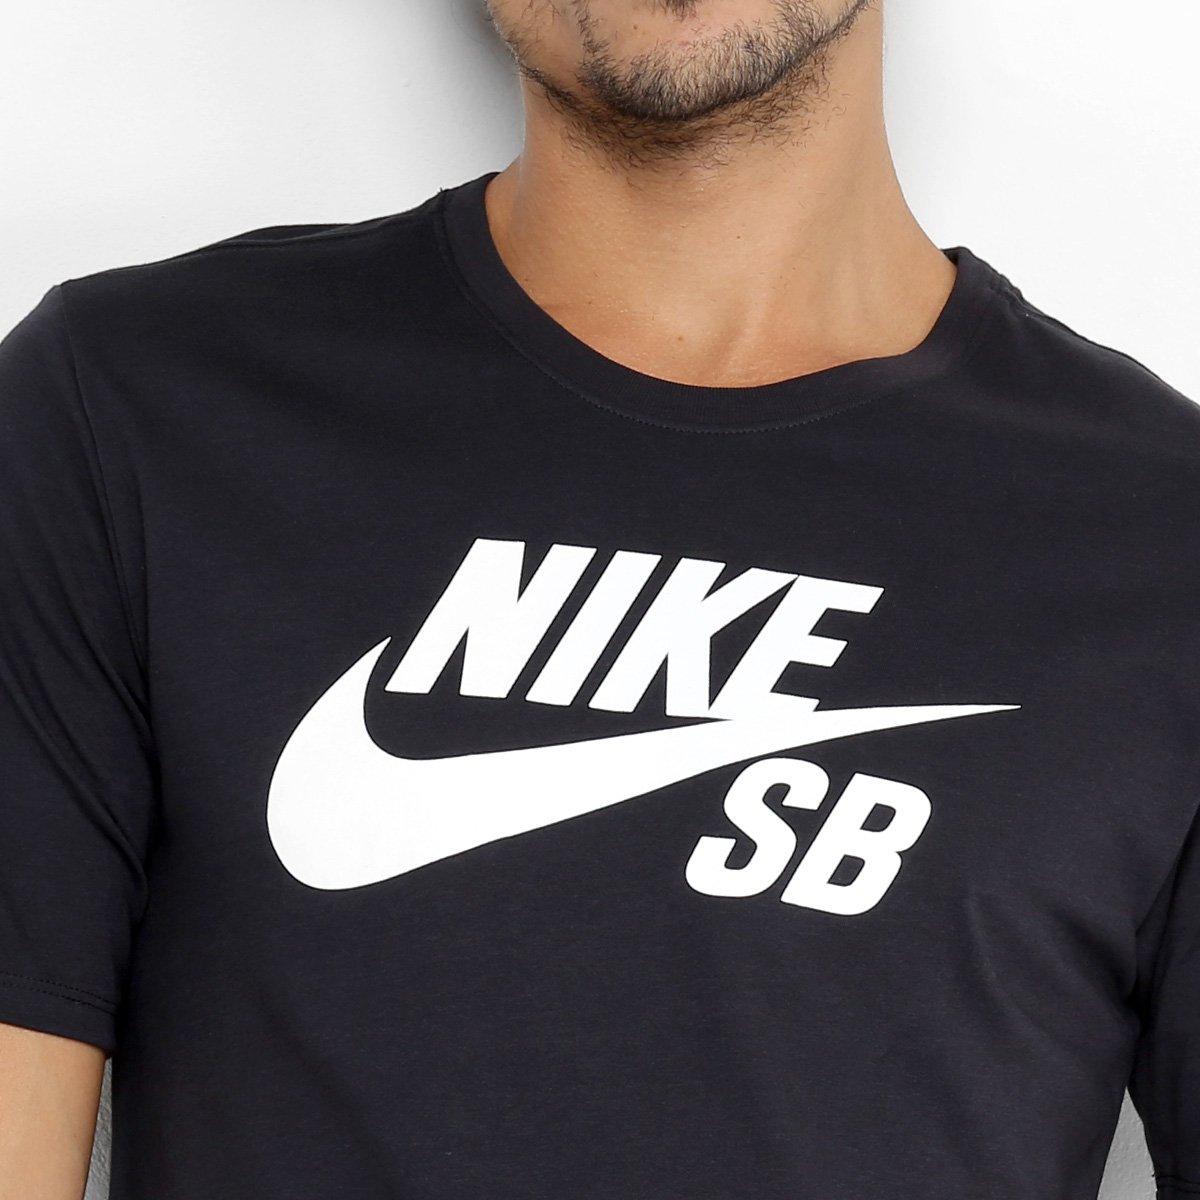 33a0e6f7b9 Camiseta Nike Sb Logo Masculina - Preto e Branco - Compre Agora ...